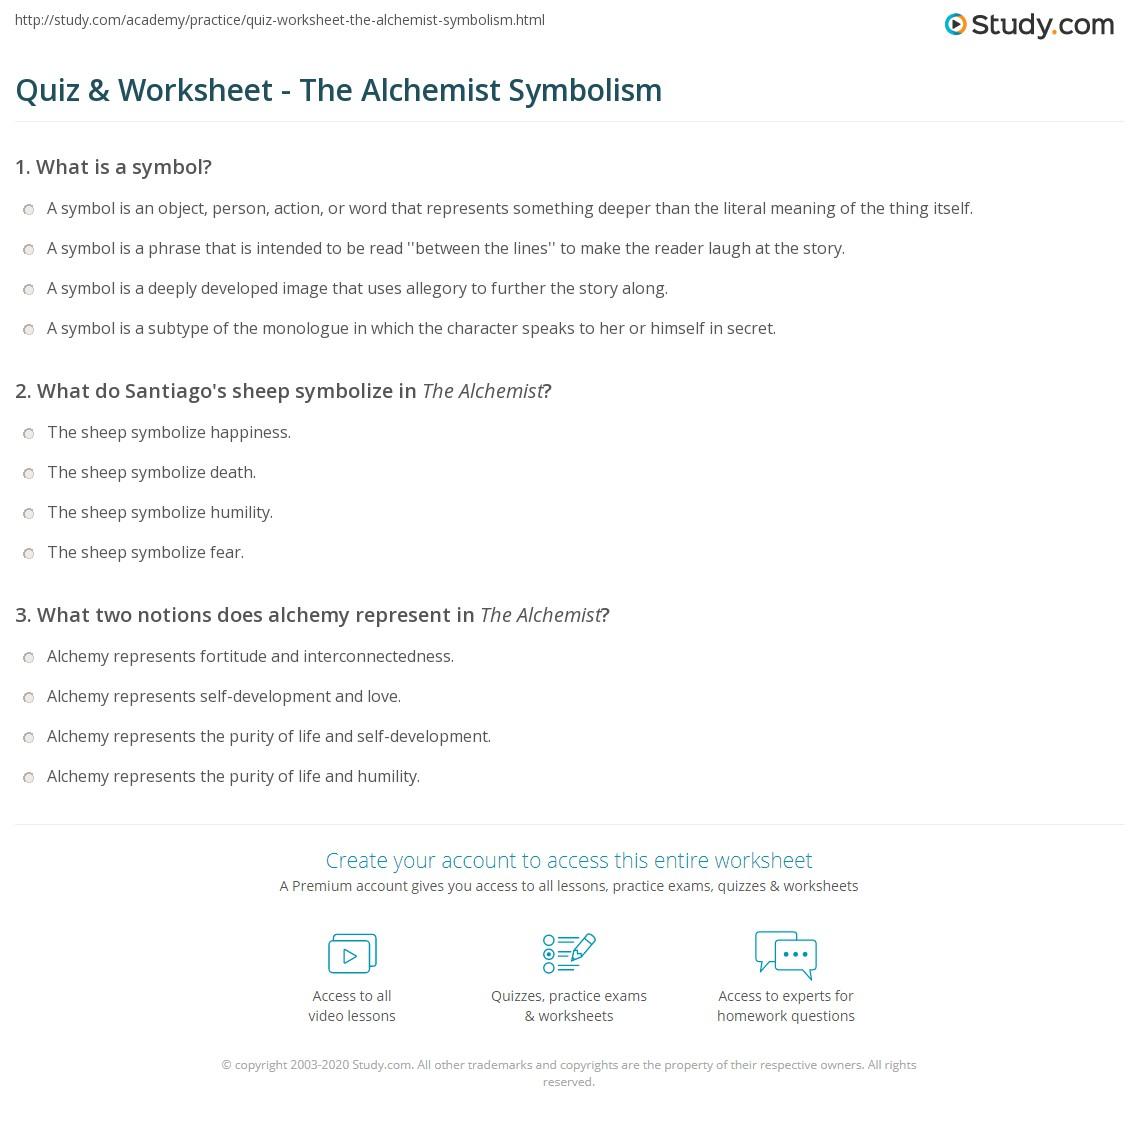 Quiz Worksheet The Alchemist Symbolism Study